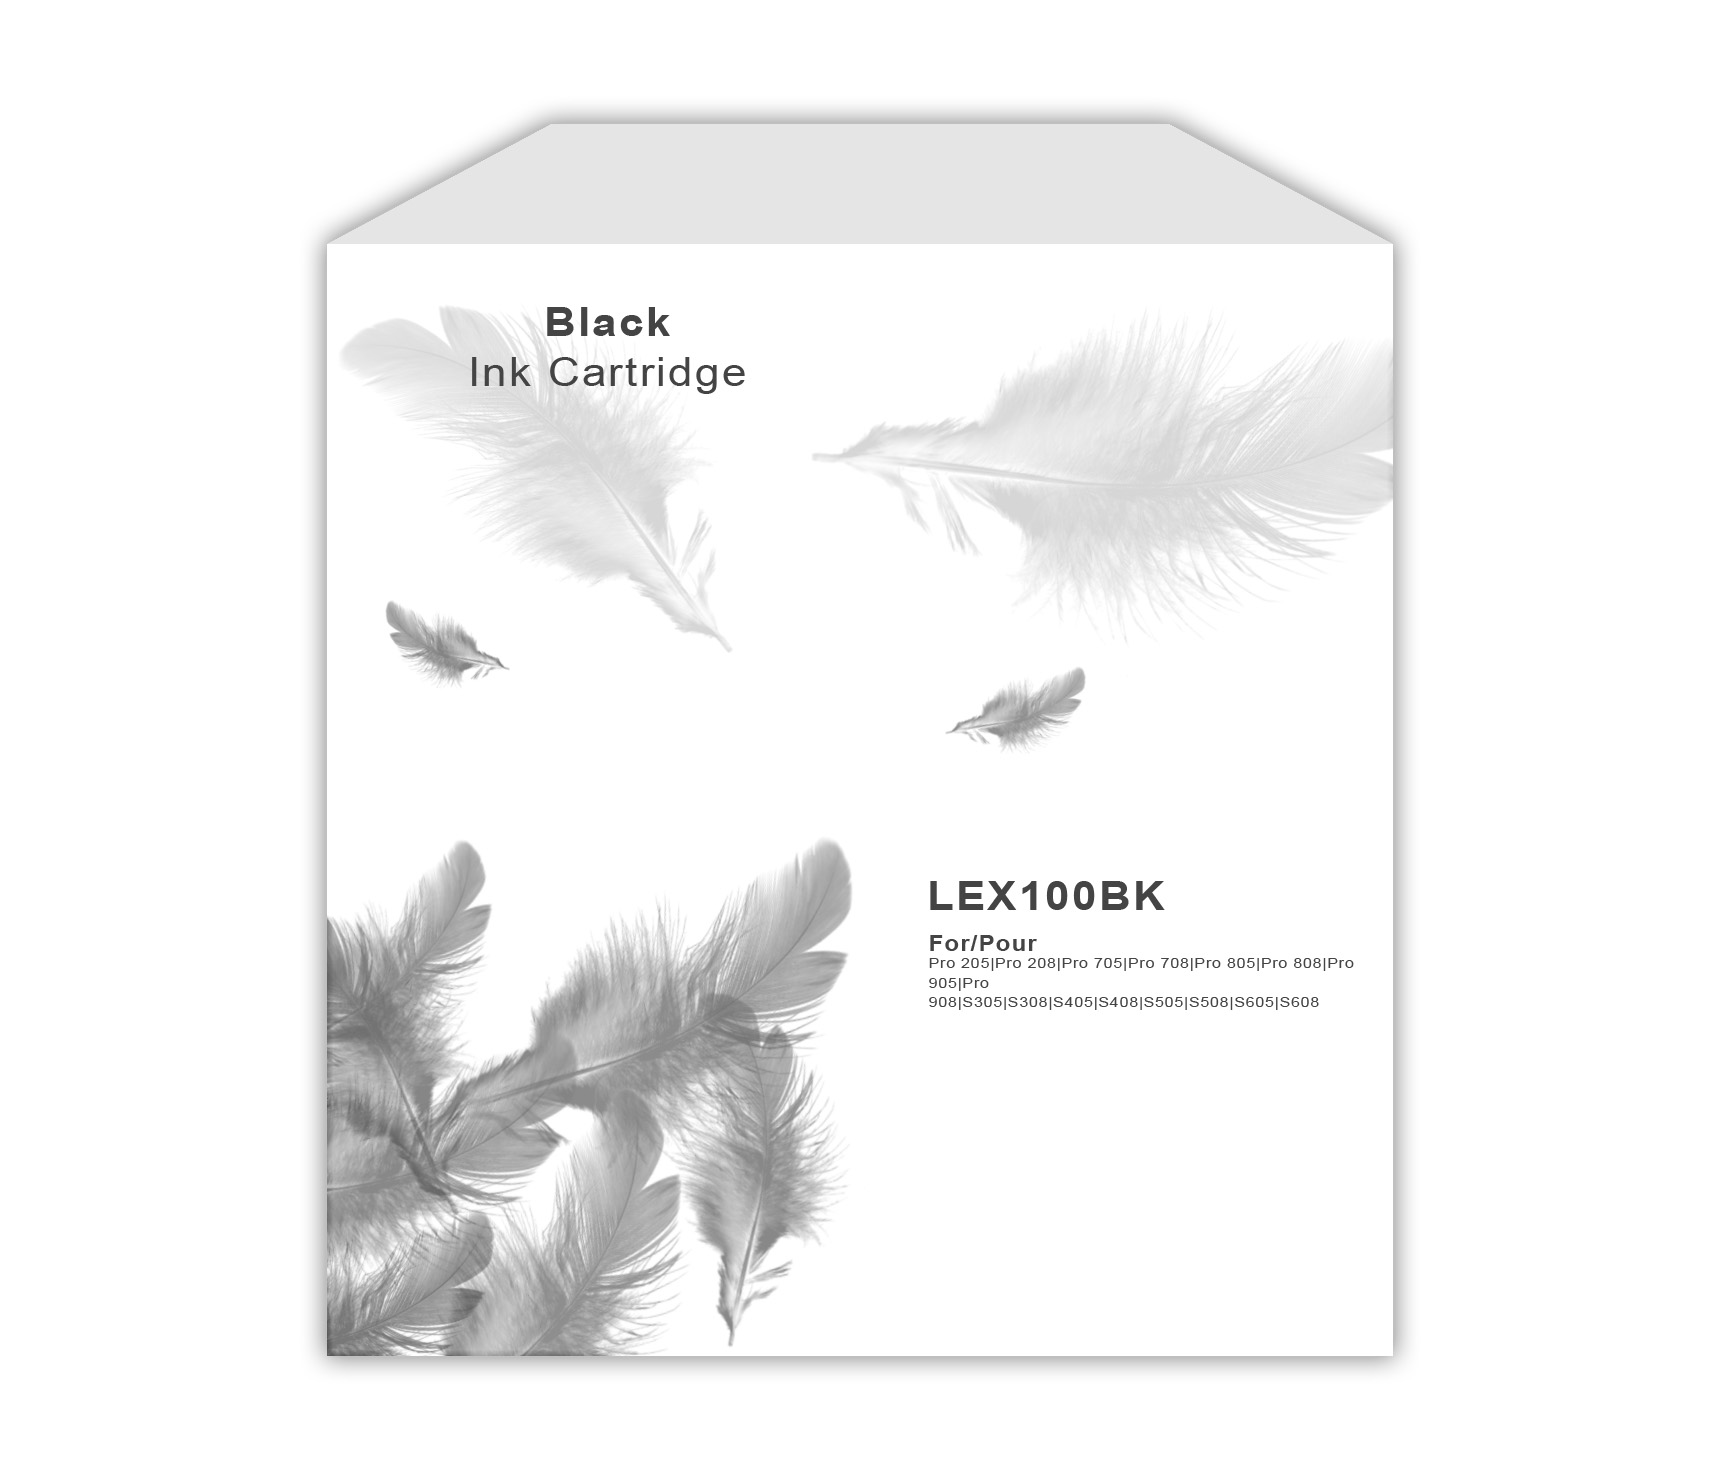 Lexmark 100 Black Ink Cartridge